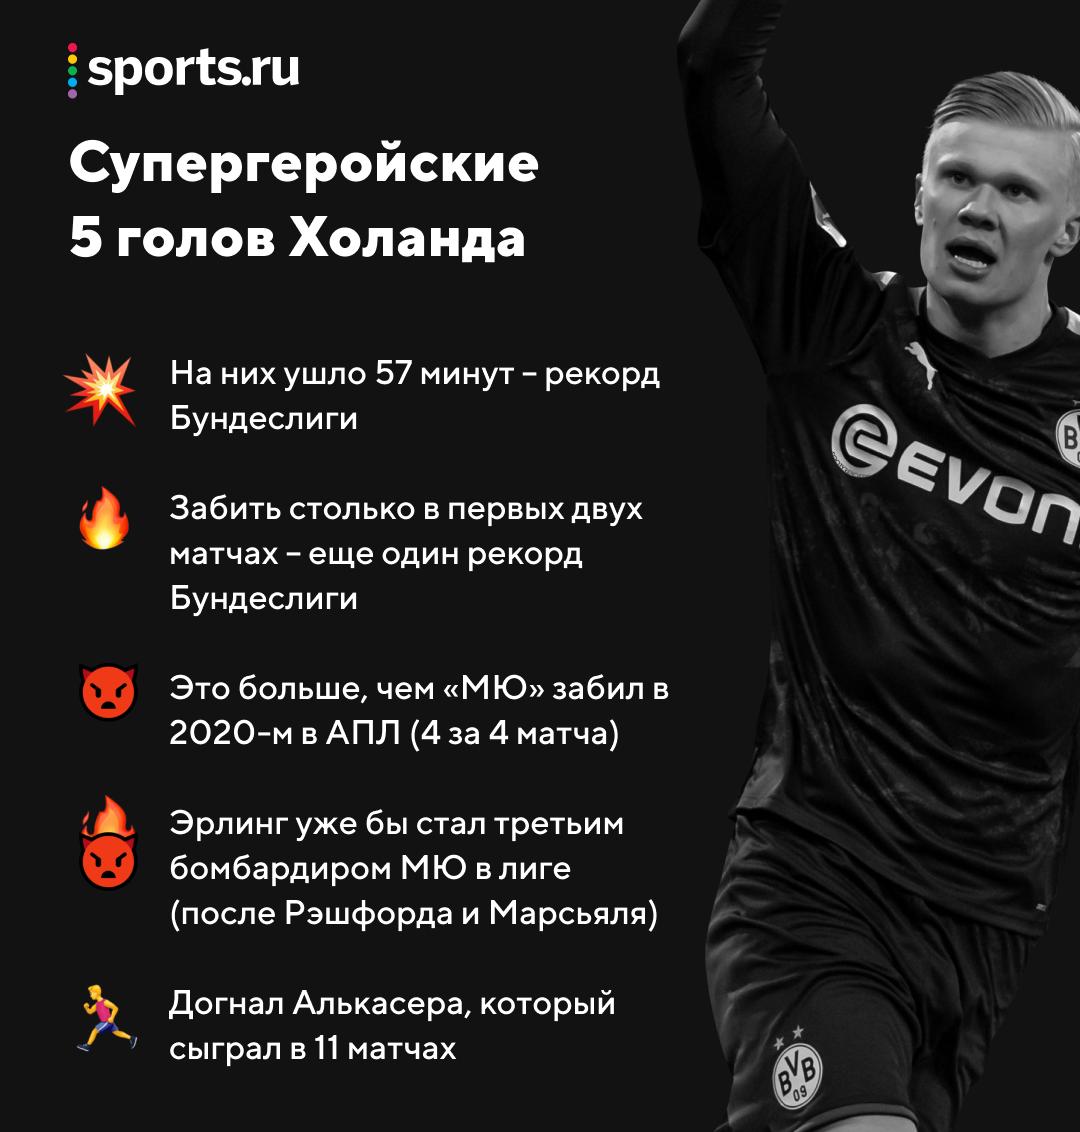 Боруссия дортмунд спортс ру